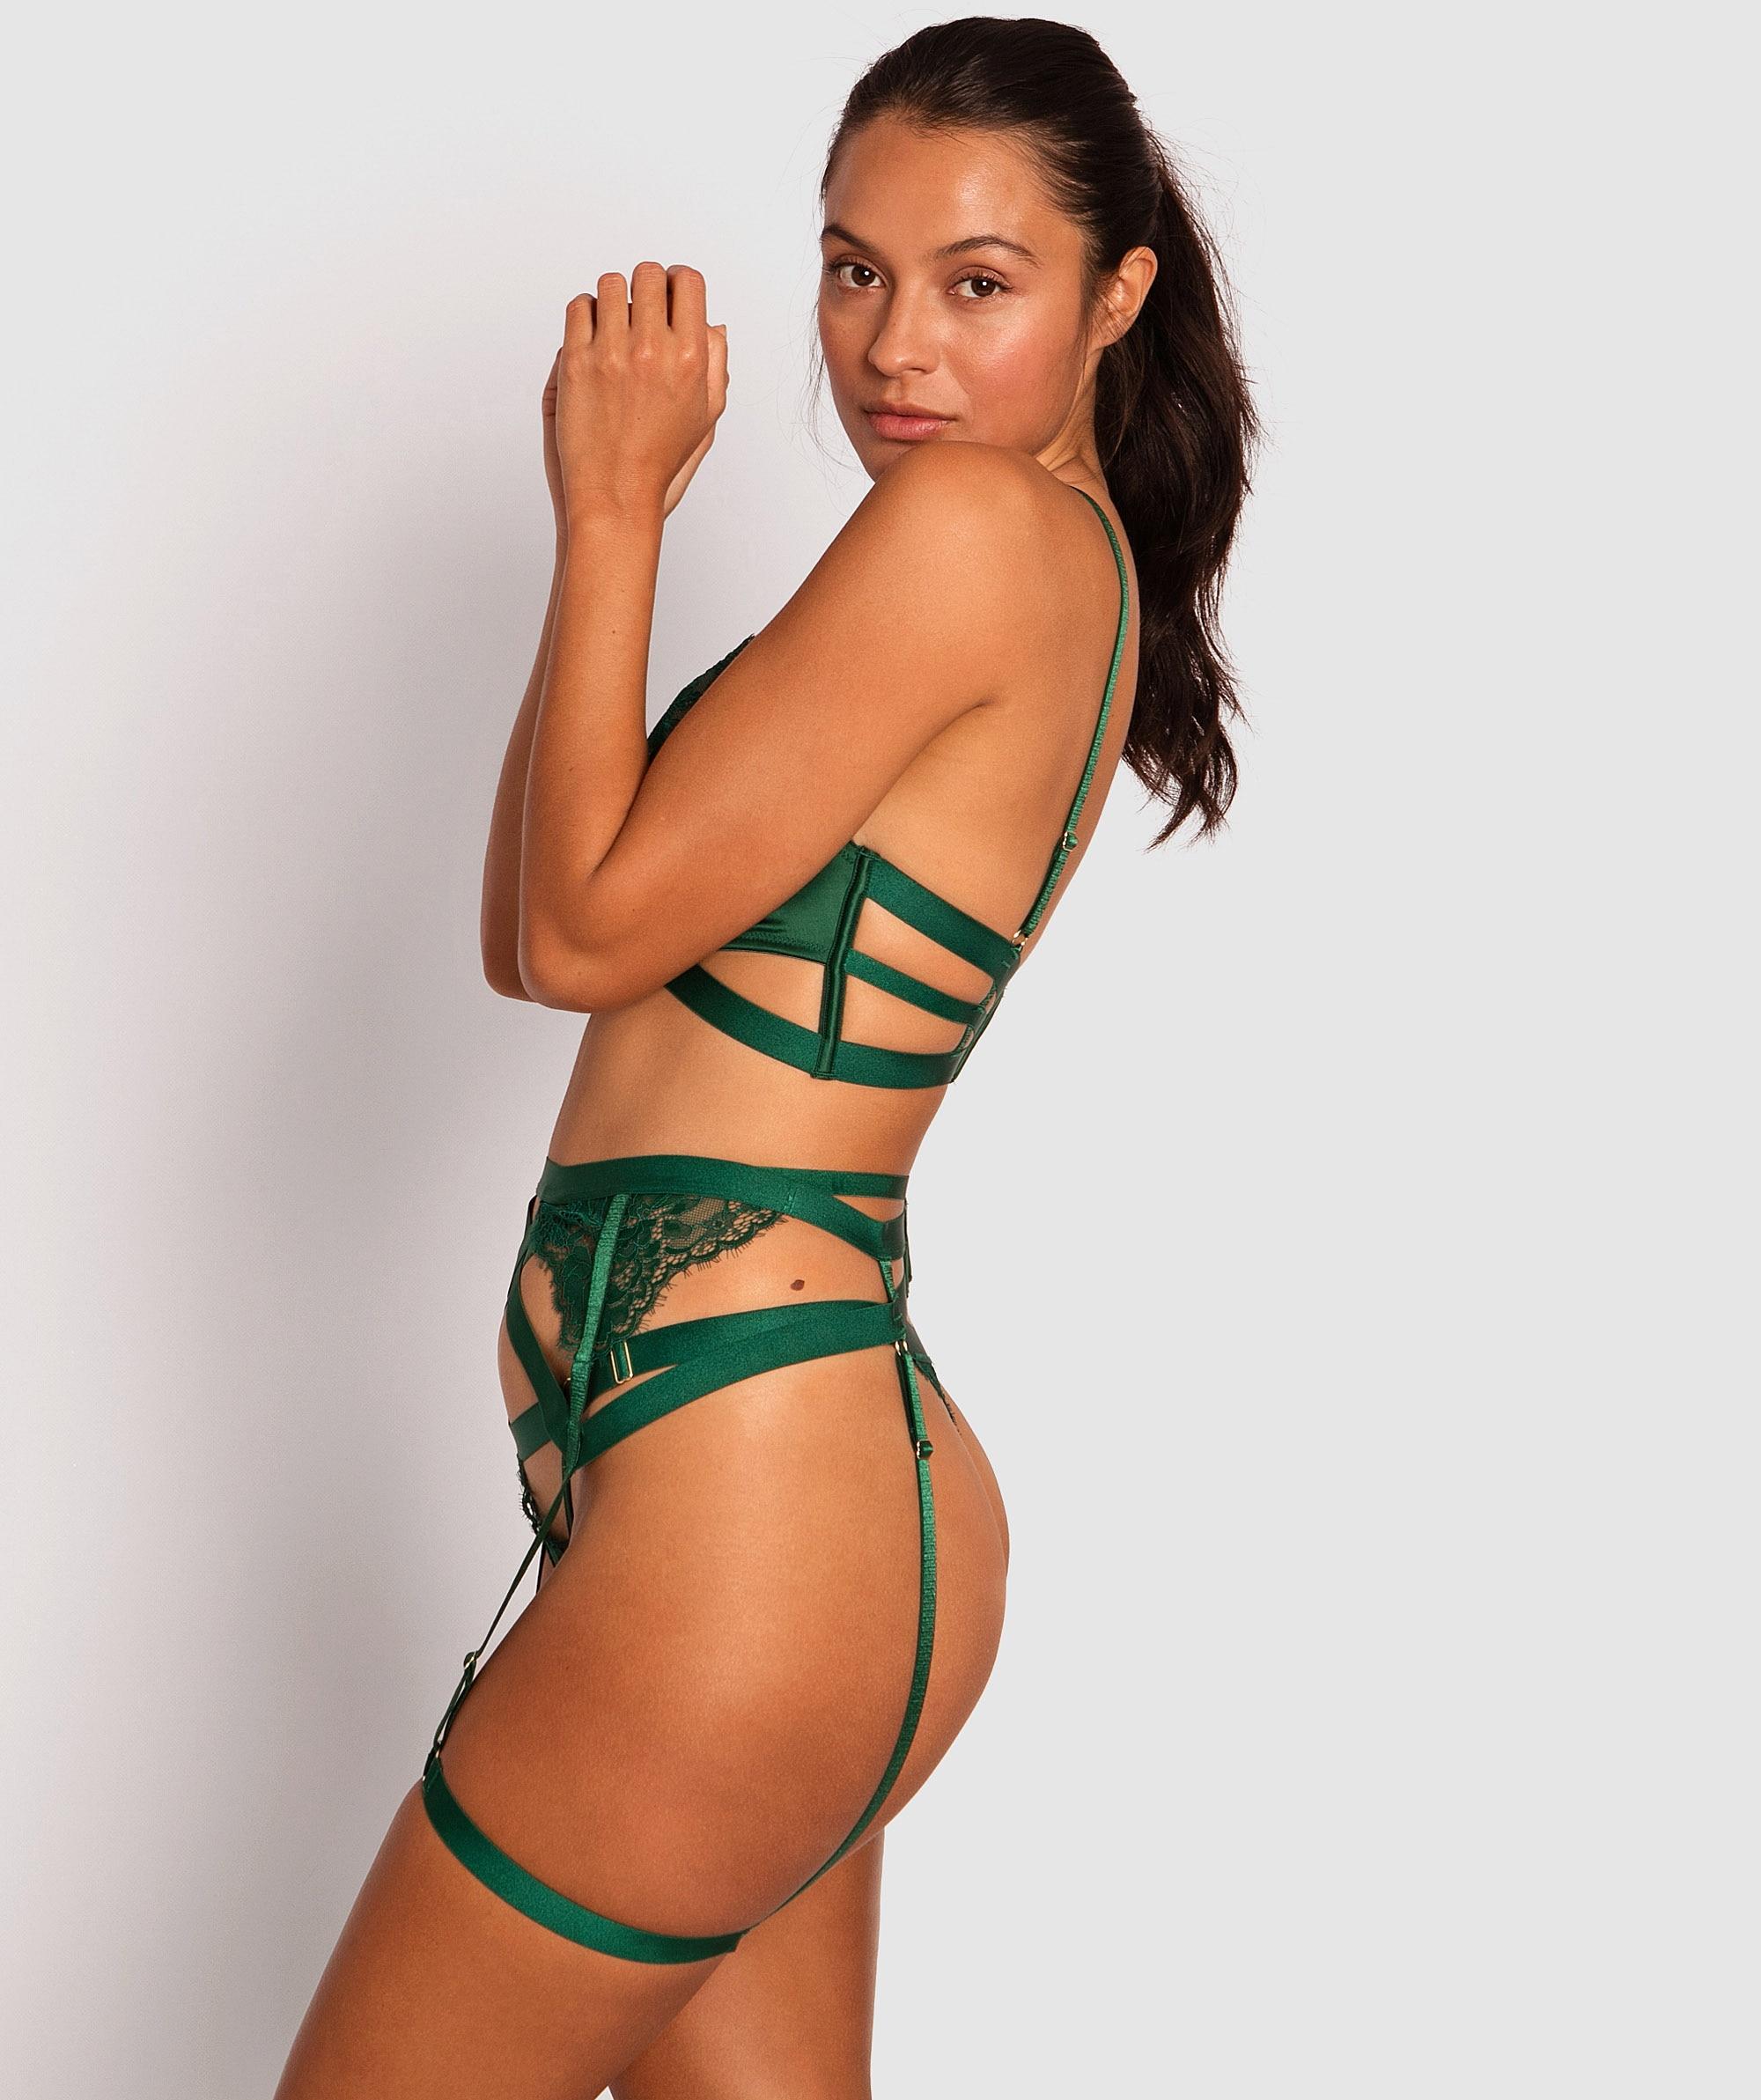 Shiloh Suspender - Dark Green